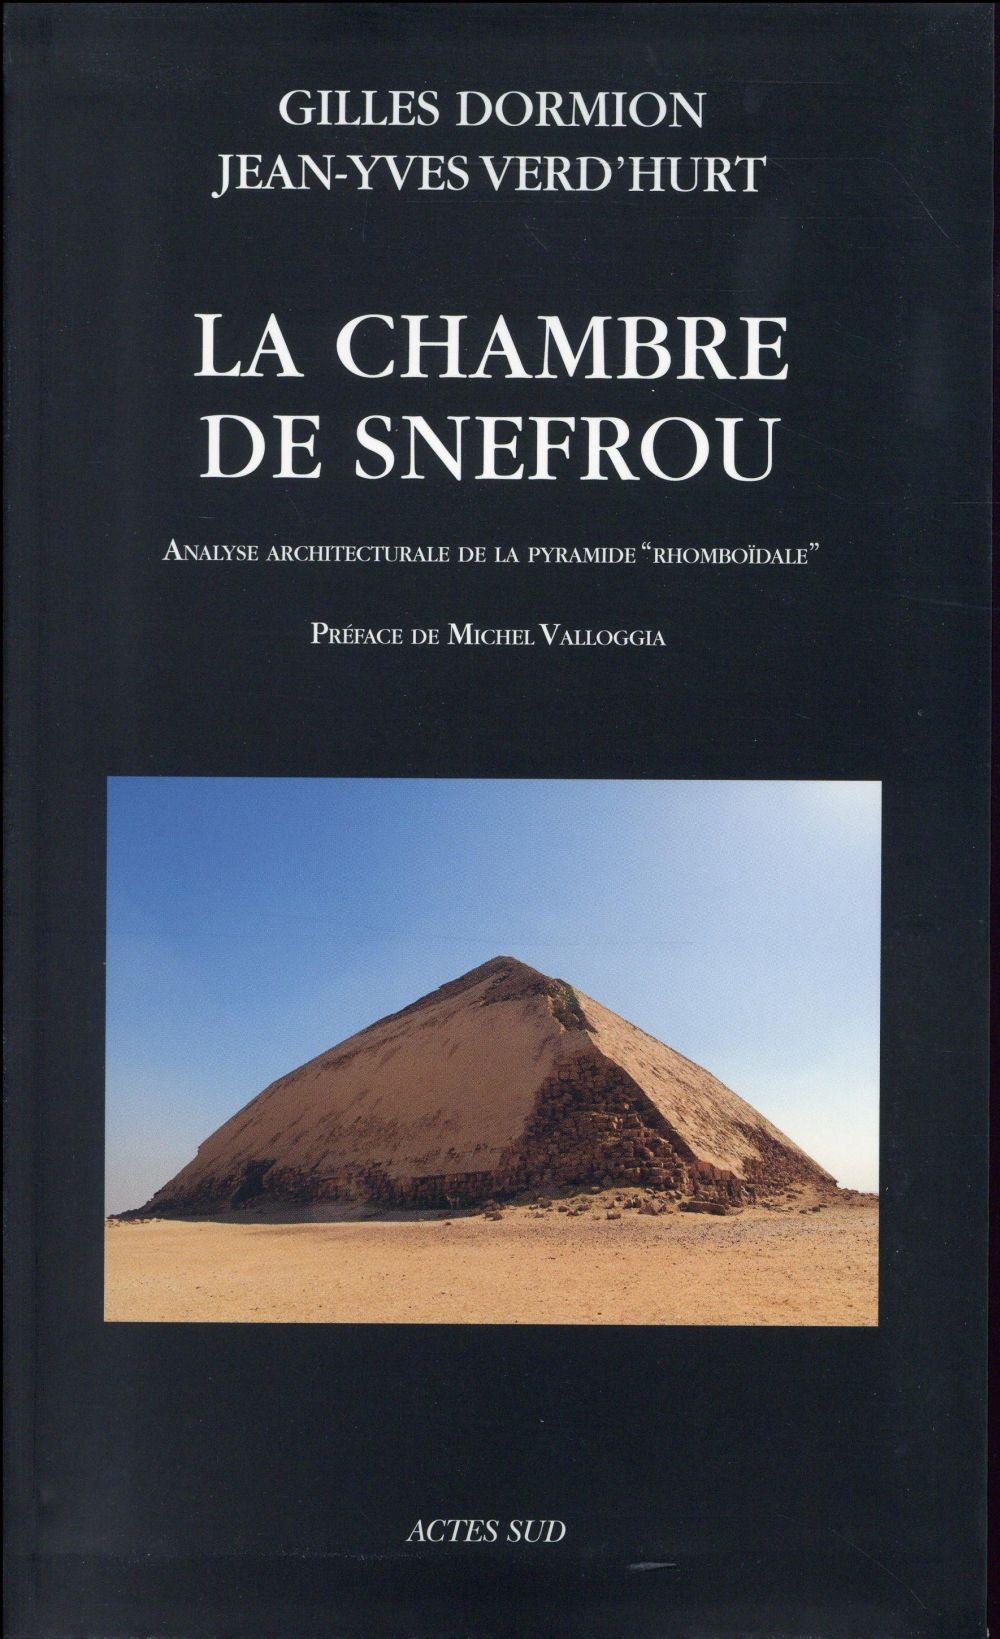 La chambre de Snefrou ; analyse architecturale de la pyramide